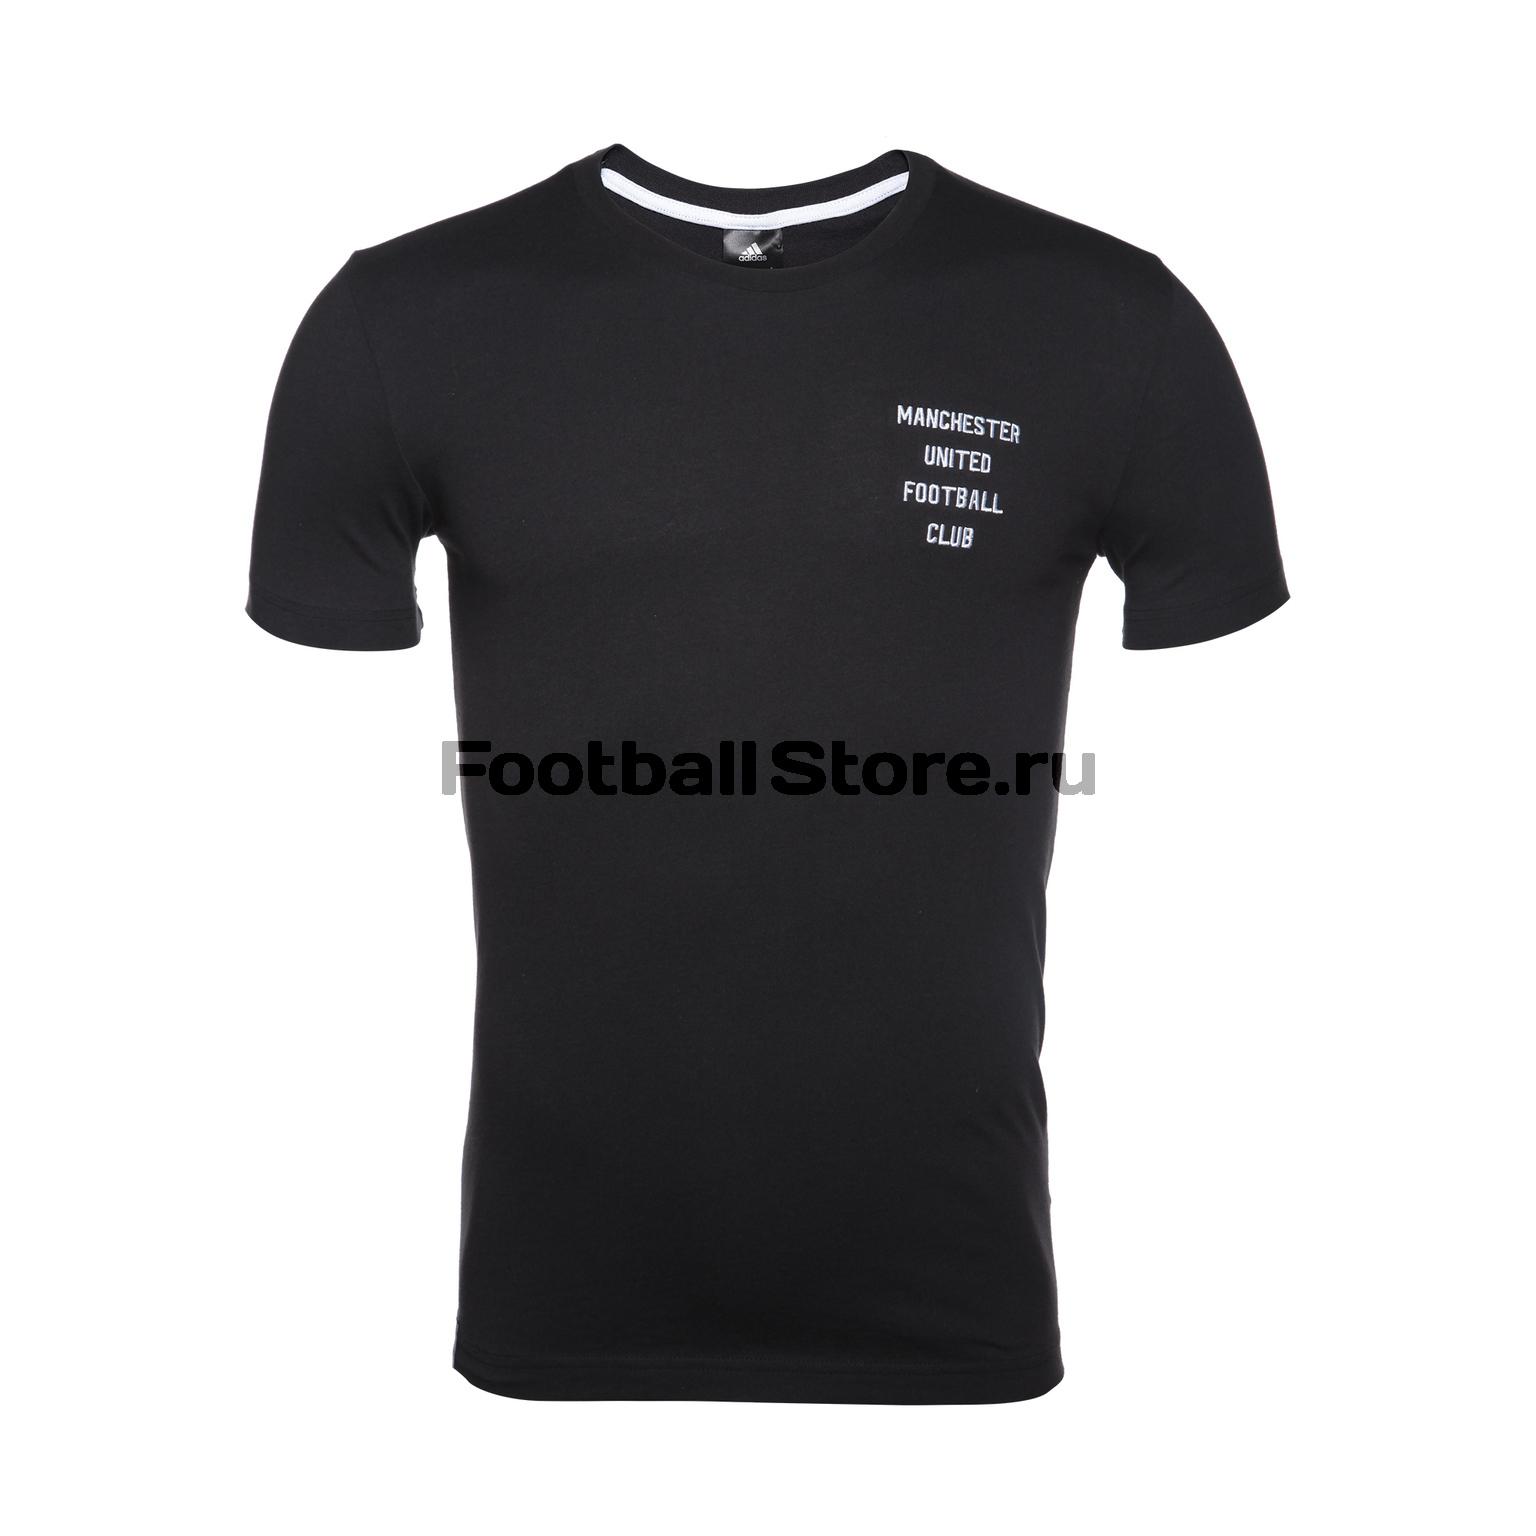 Футболка тренировочная Adidas Manchester United Tee CF2338 футболка тренировочная adidas tiro17 tee ay2964